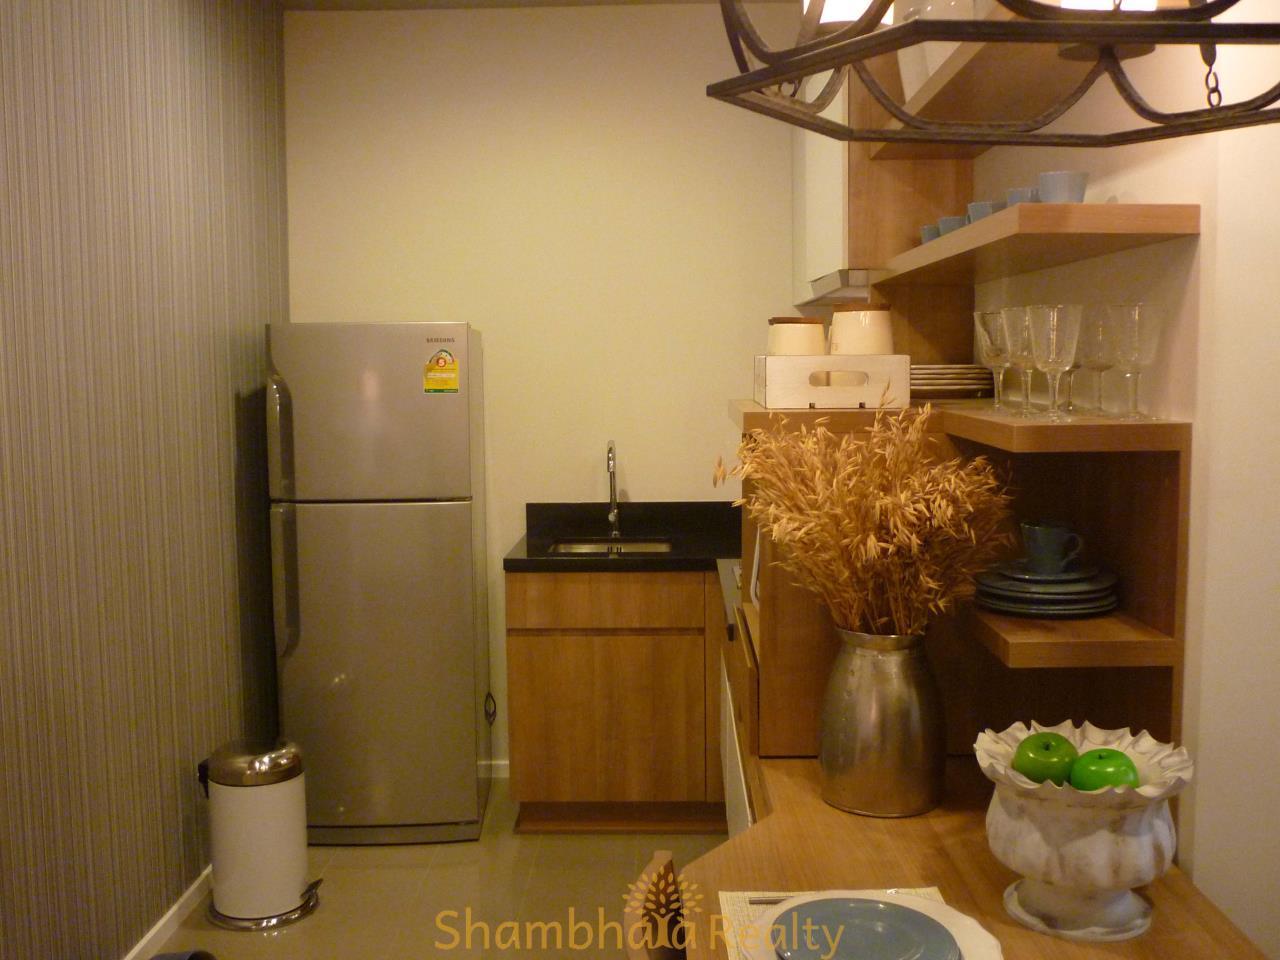 Shambhala Realty Agency's Blocs 77 by Sansiri Condominium for Sale in Sukhumvit 77 6